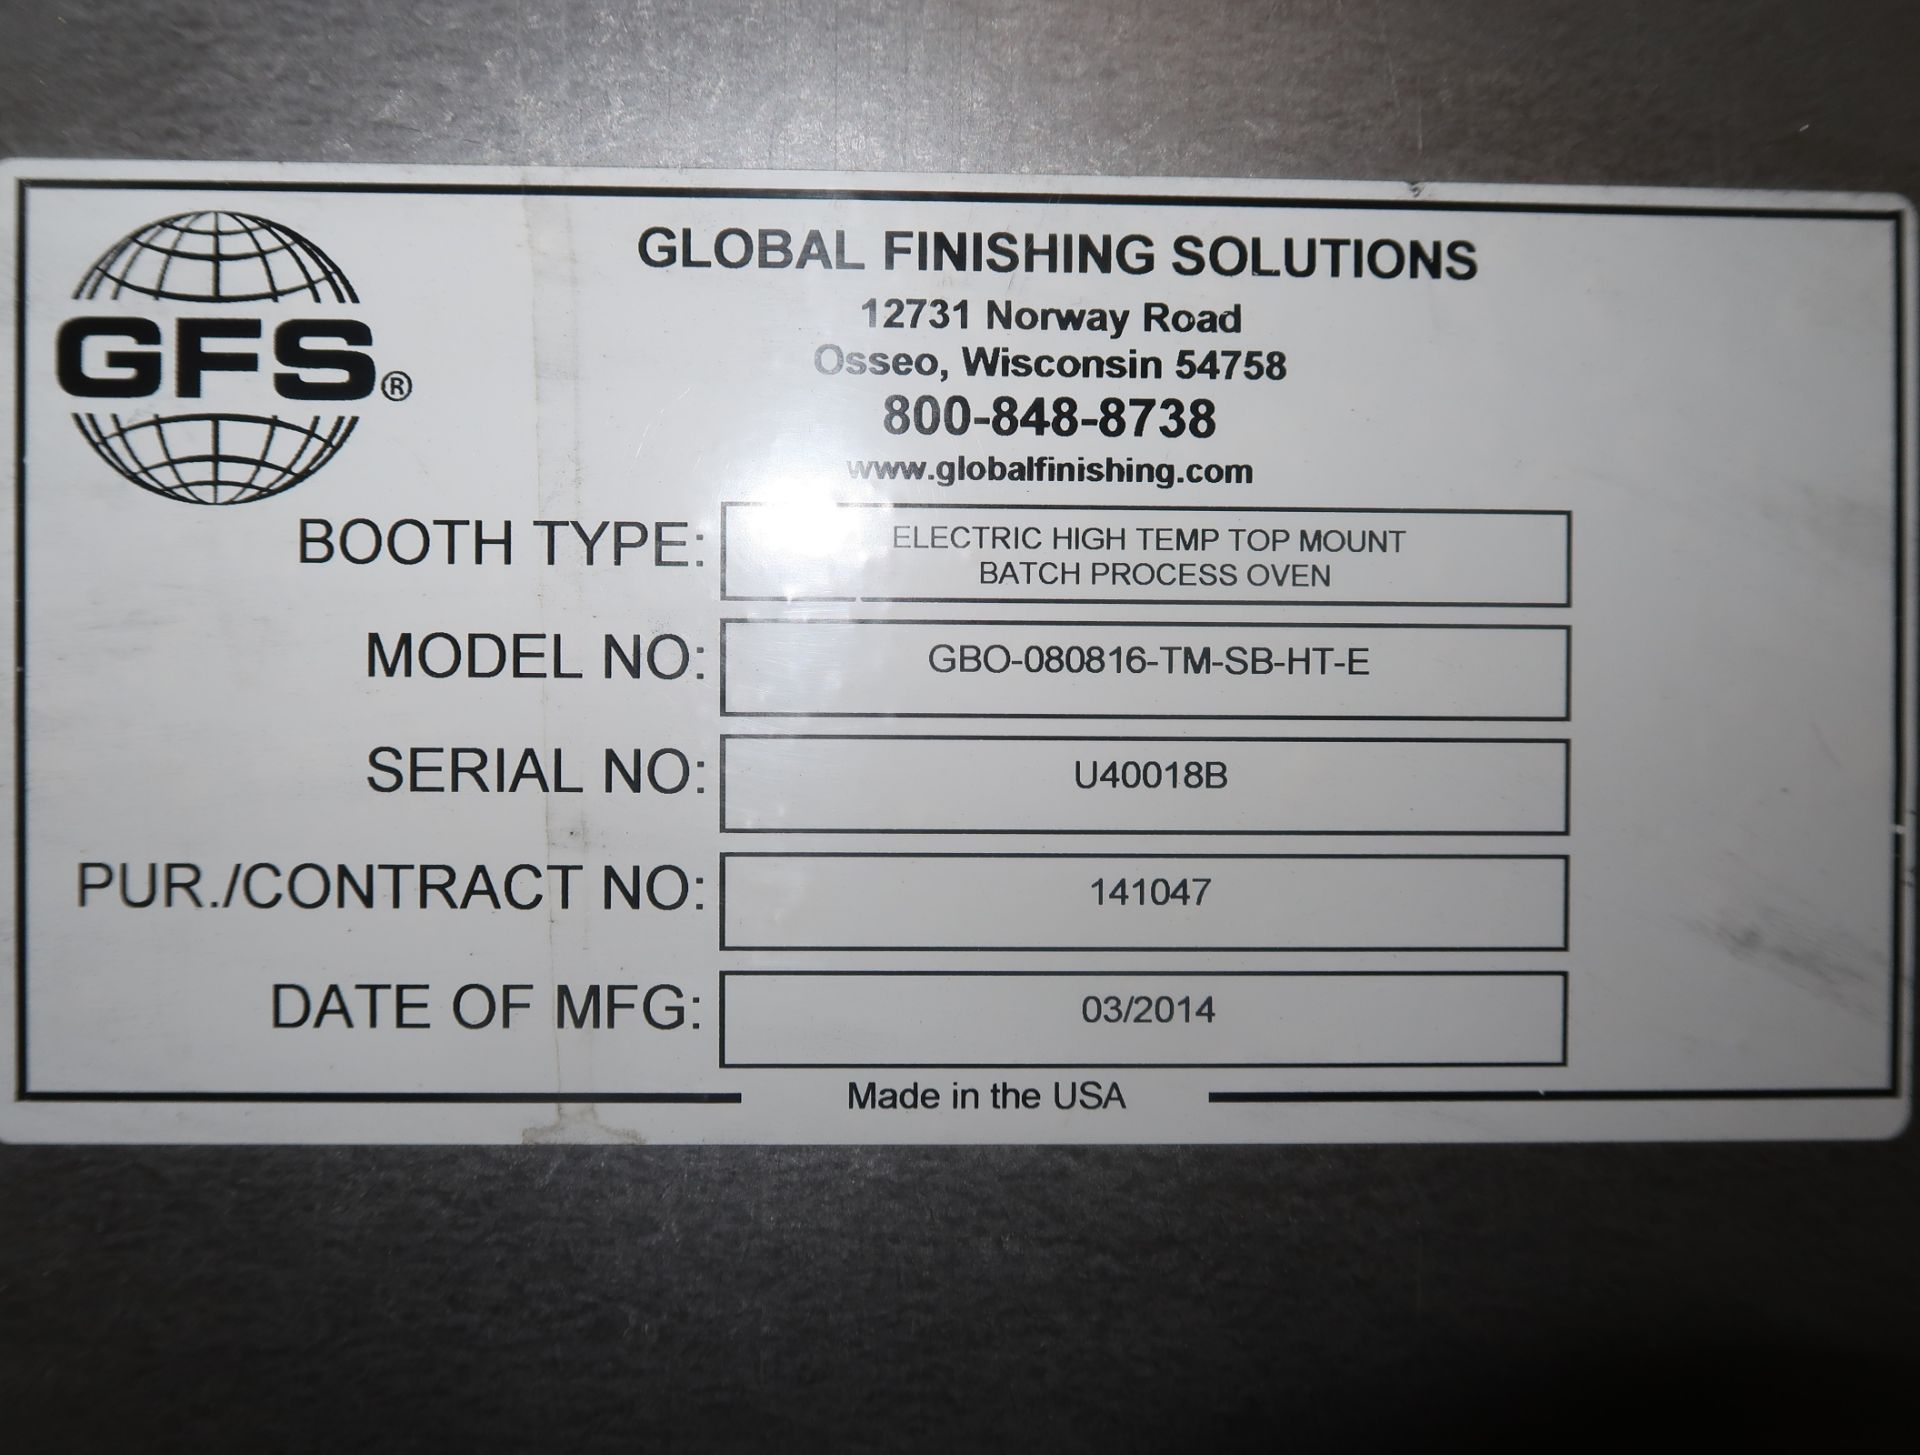 Lot 33 - GOLBAL FINISHING SOLUTIONS 8'X8'X16' ELEC. HIGH TEMP TOP MOUNT W/ CONTROL PANEL BATCH PROCESS OVEN